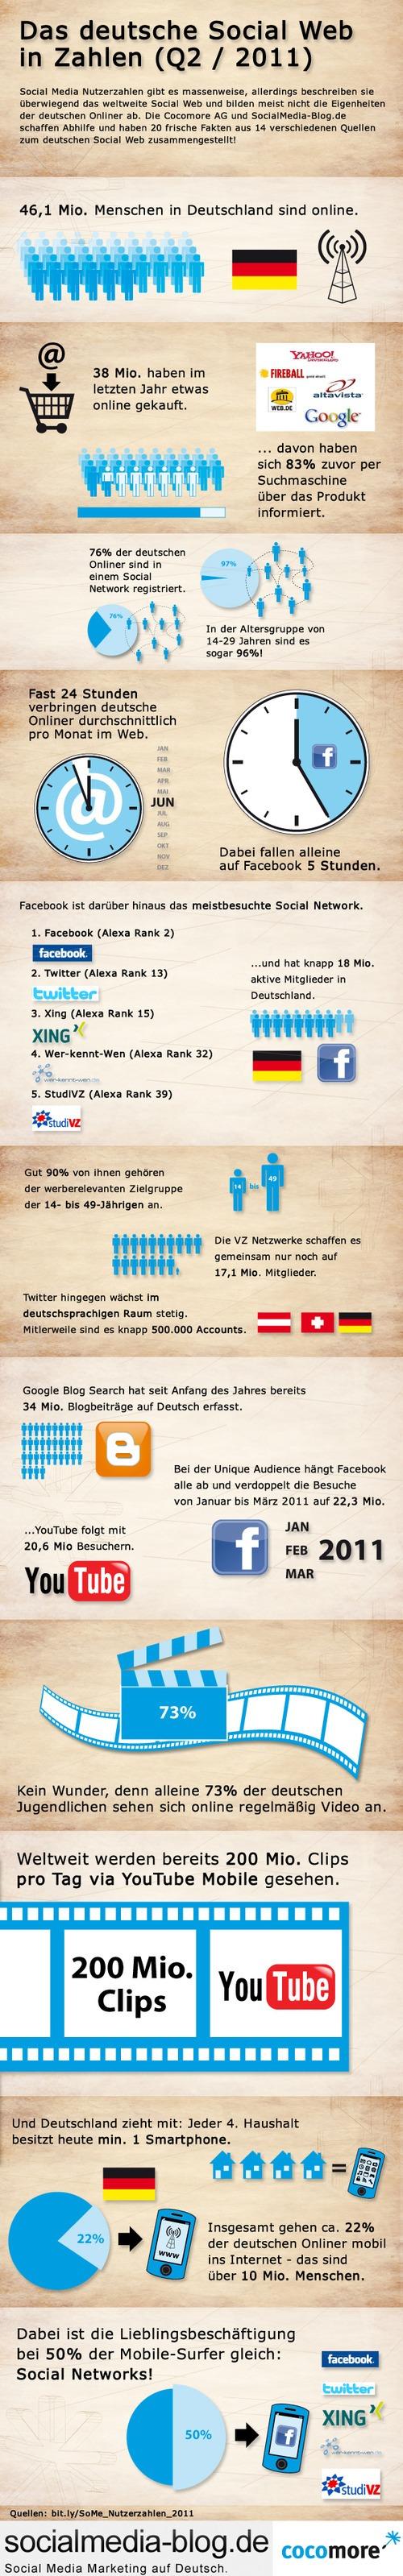 grafik Social Stats Zahlen